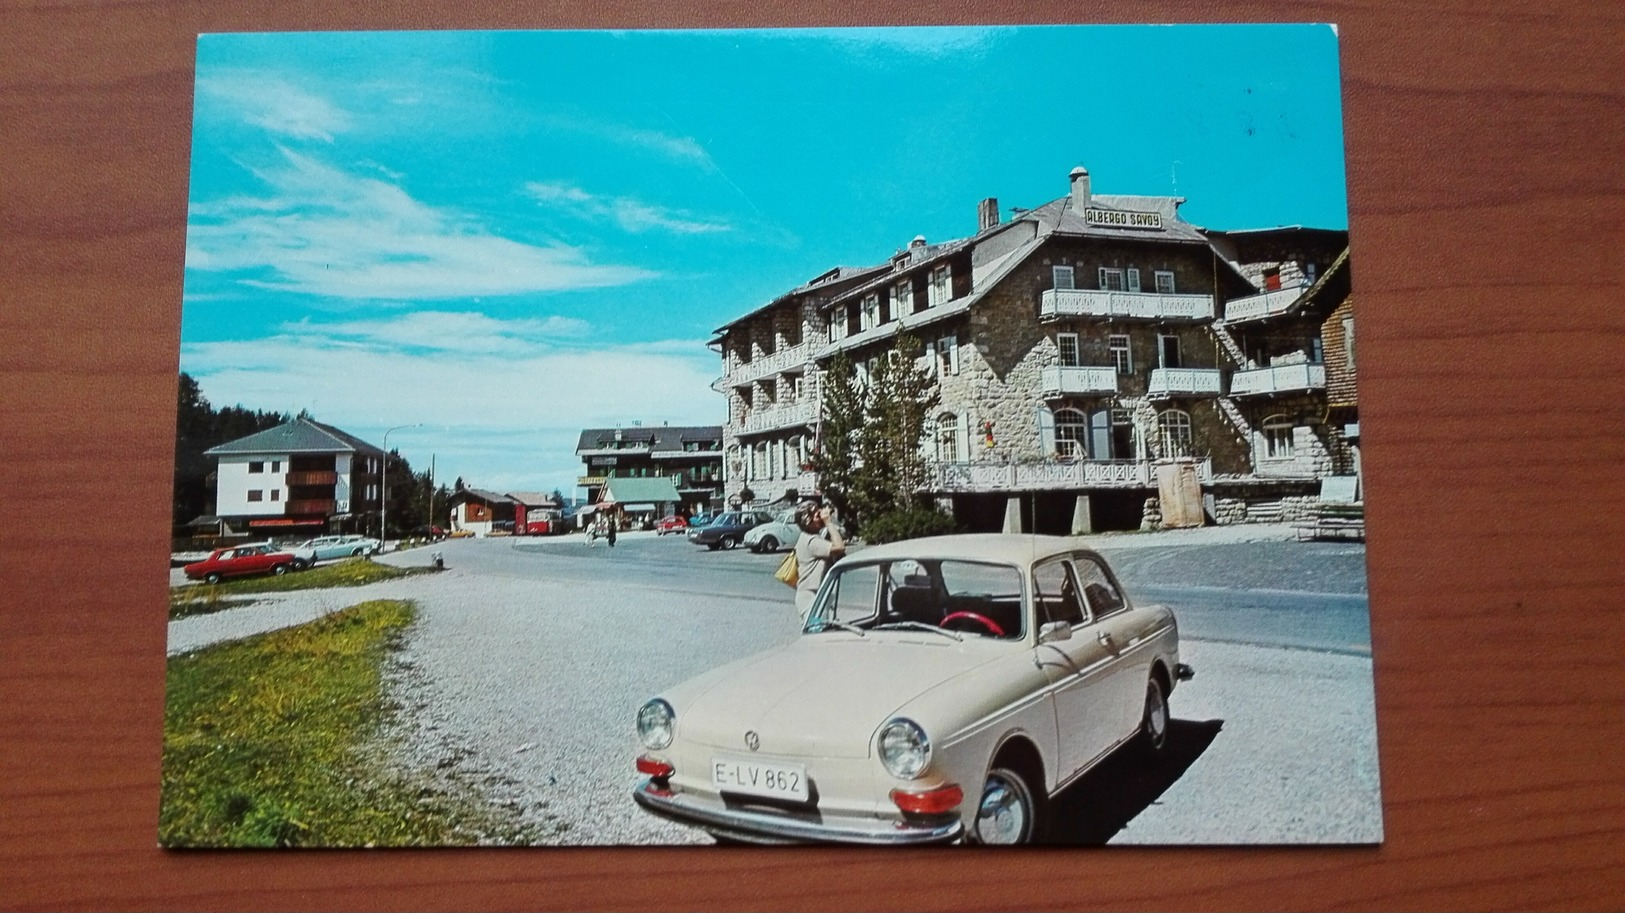 Dolomiti : Passo Carezza/Costalunga - Bolzano (Bozen)